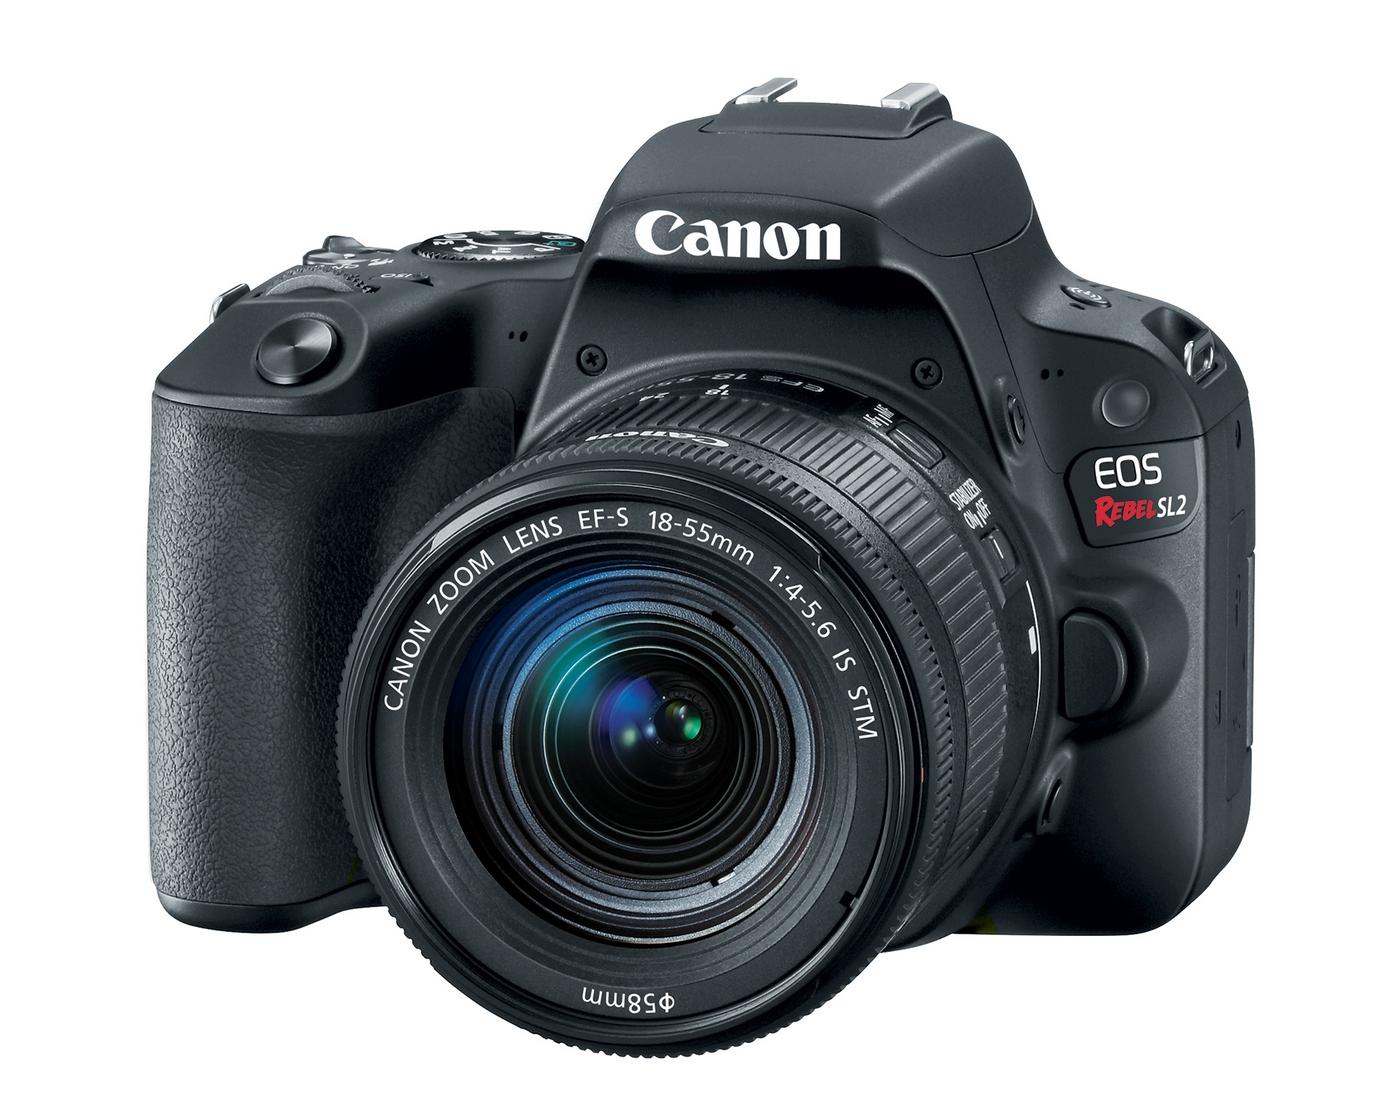 Canon's lightweight Rebel SL2 has a much-improved sensor